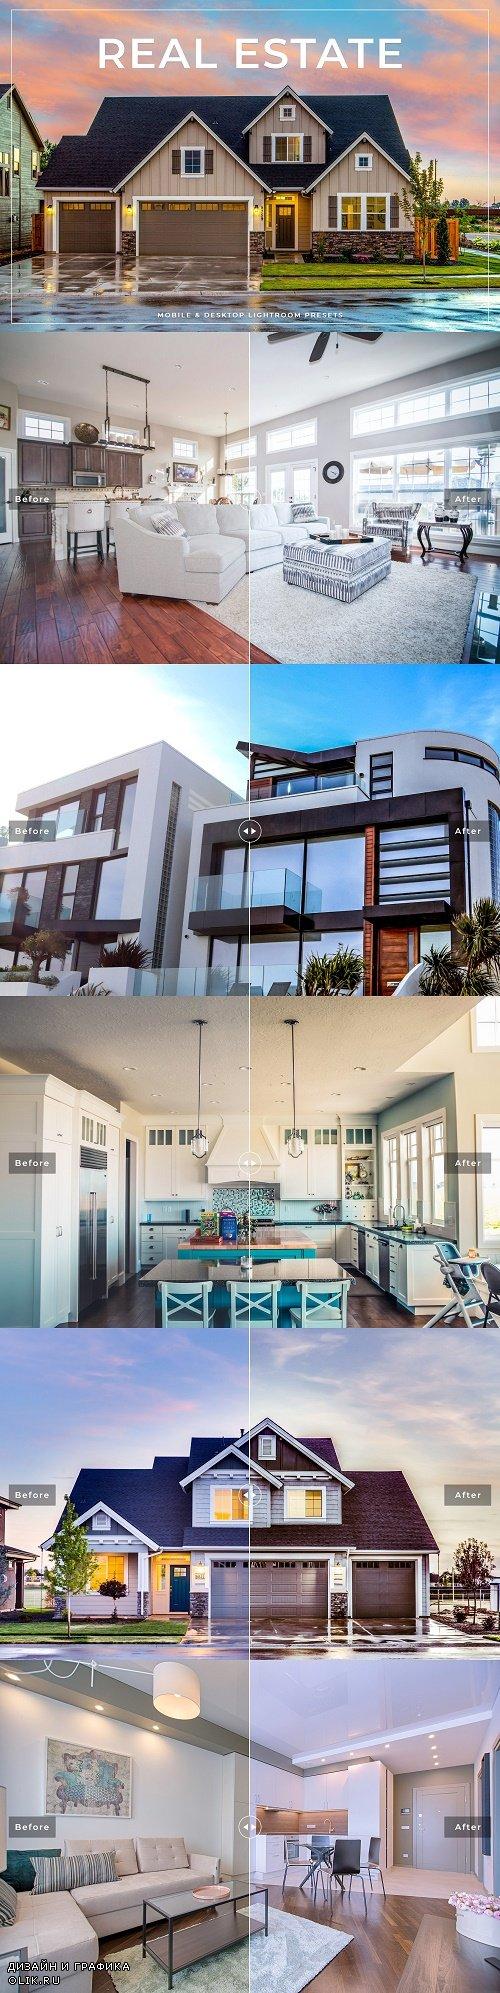 Real Estate LRM Presets - 3430828